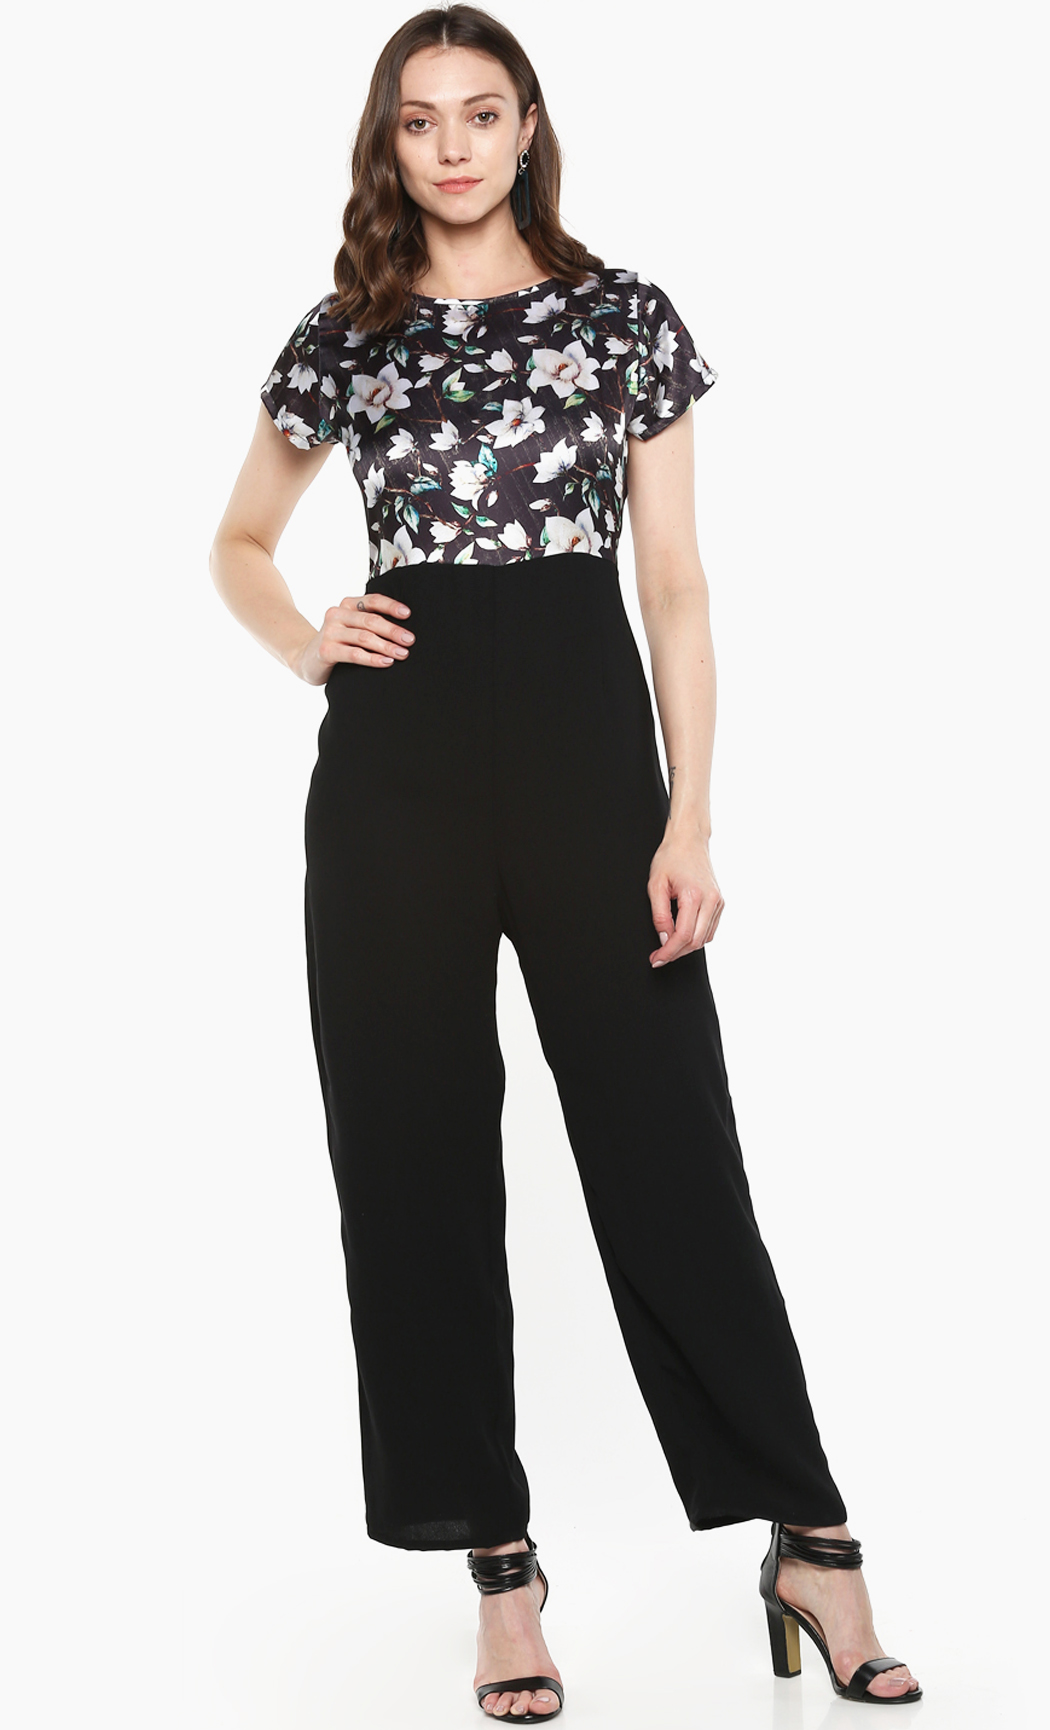 Black Night Light Floral Printed Jumpsuit. Buy Online